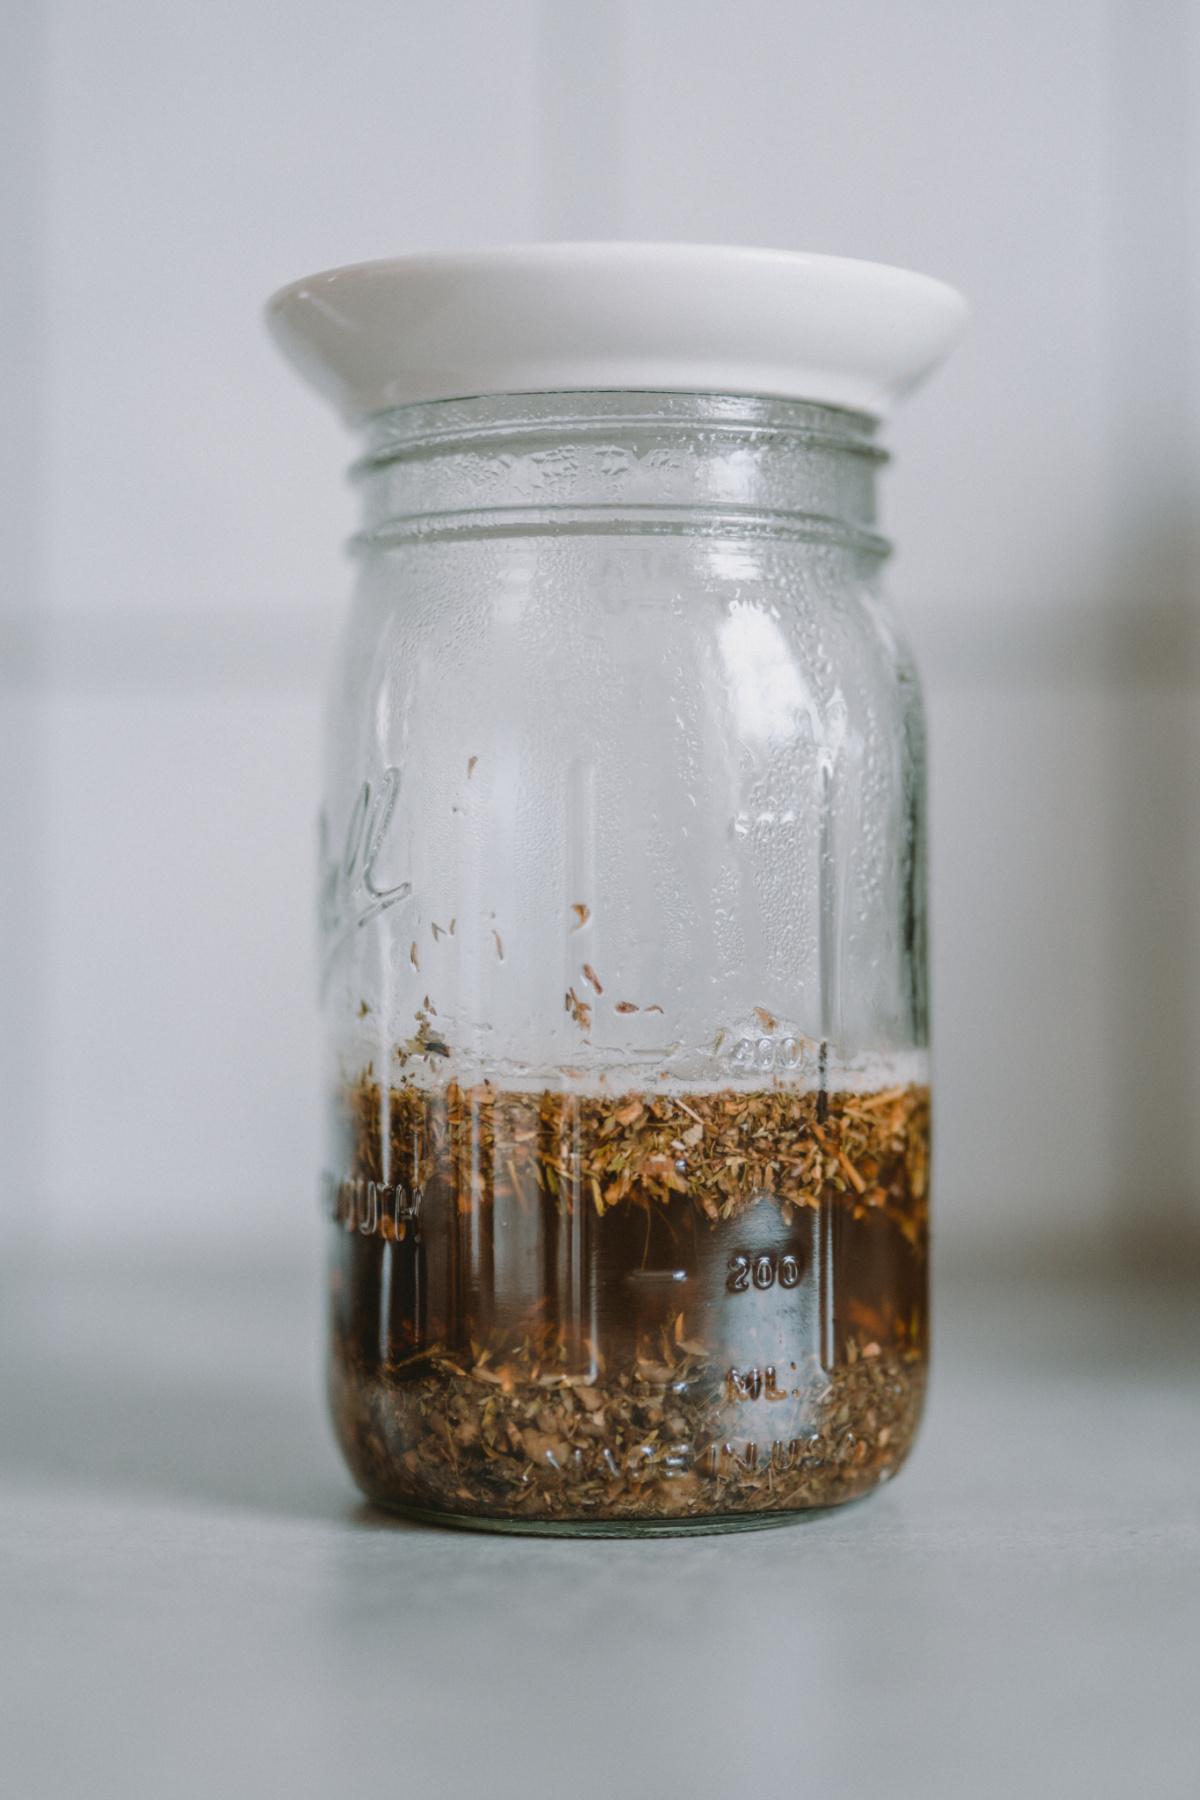 covered jar of infused herbs